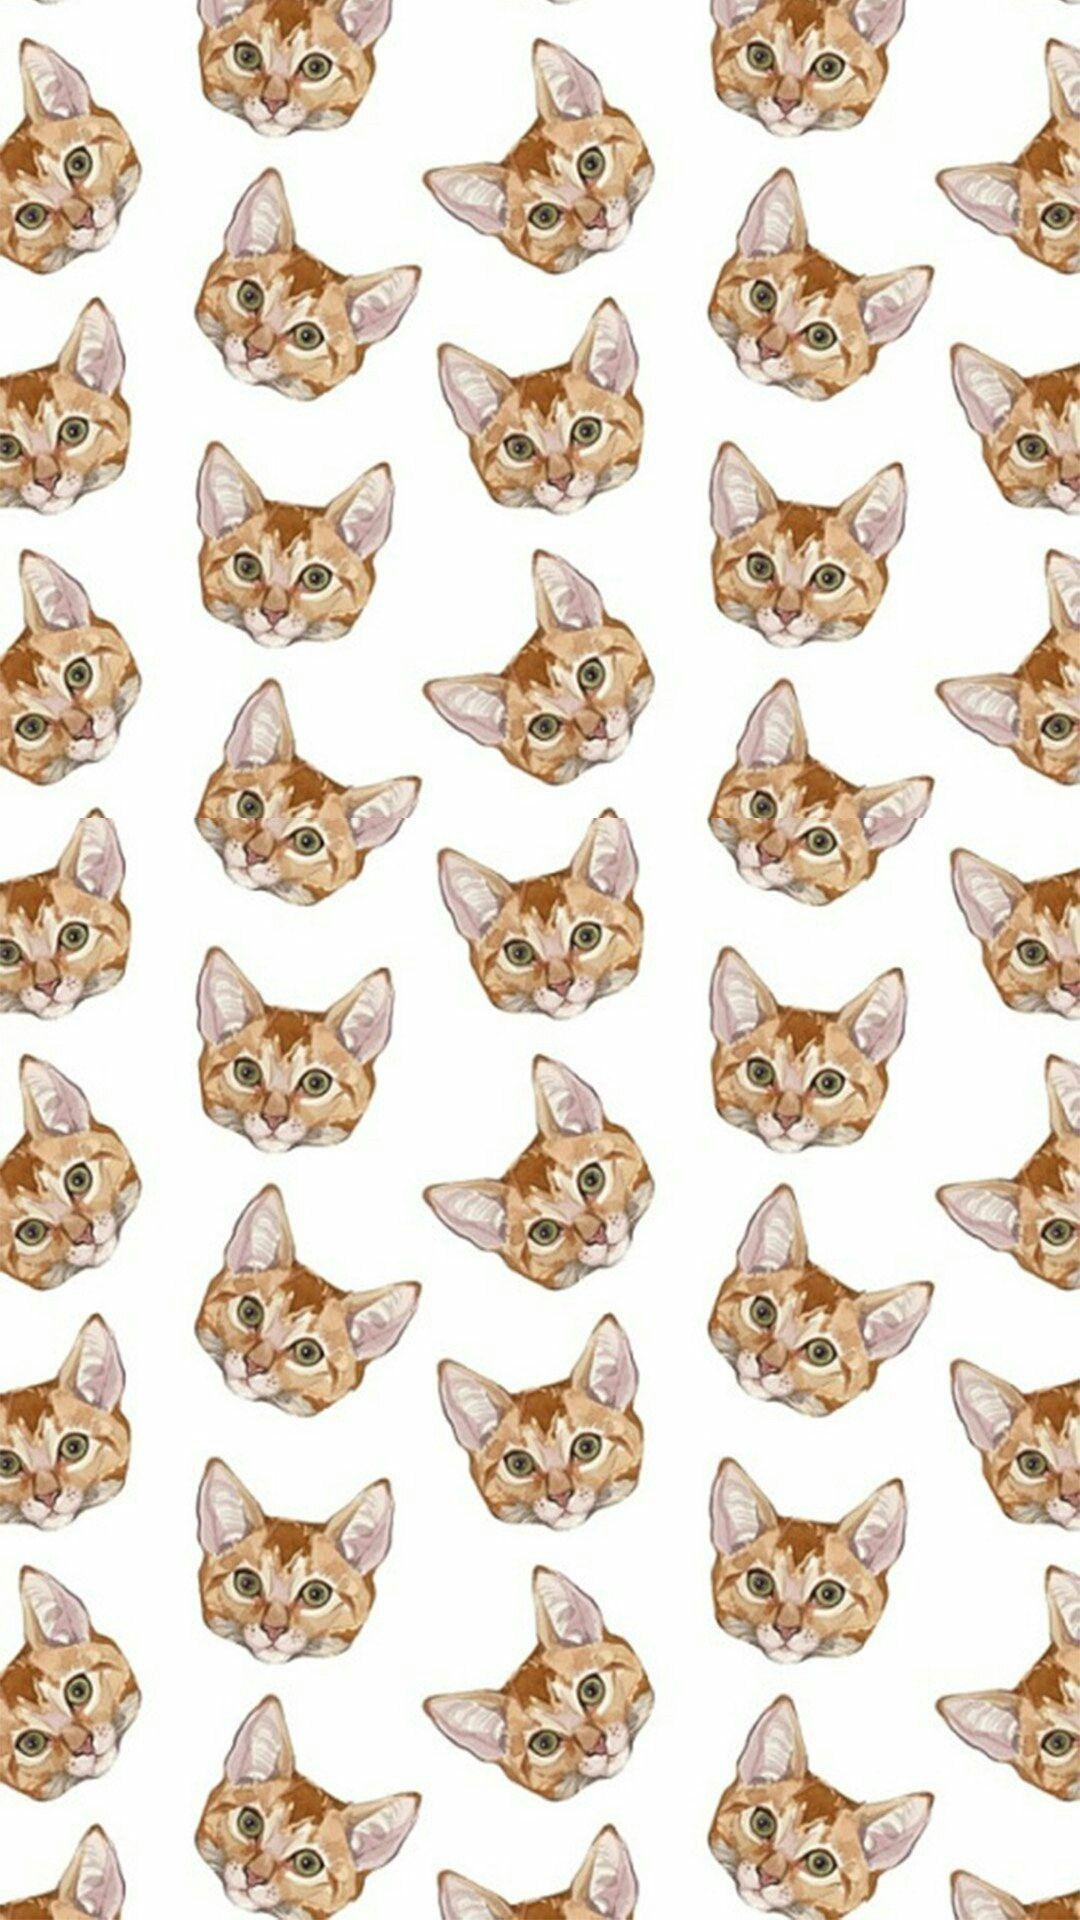 Cats pattern 😻😻